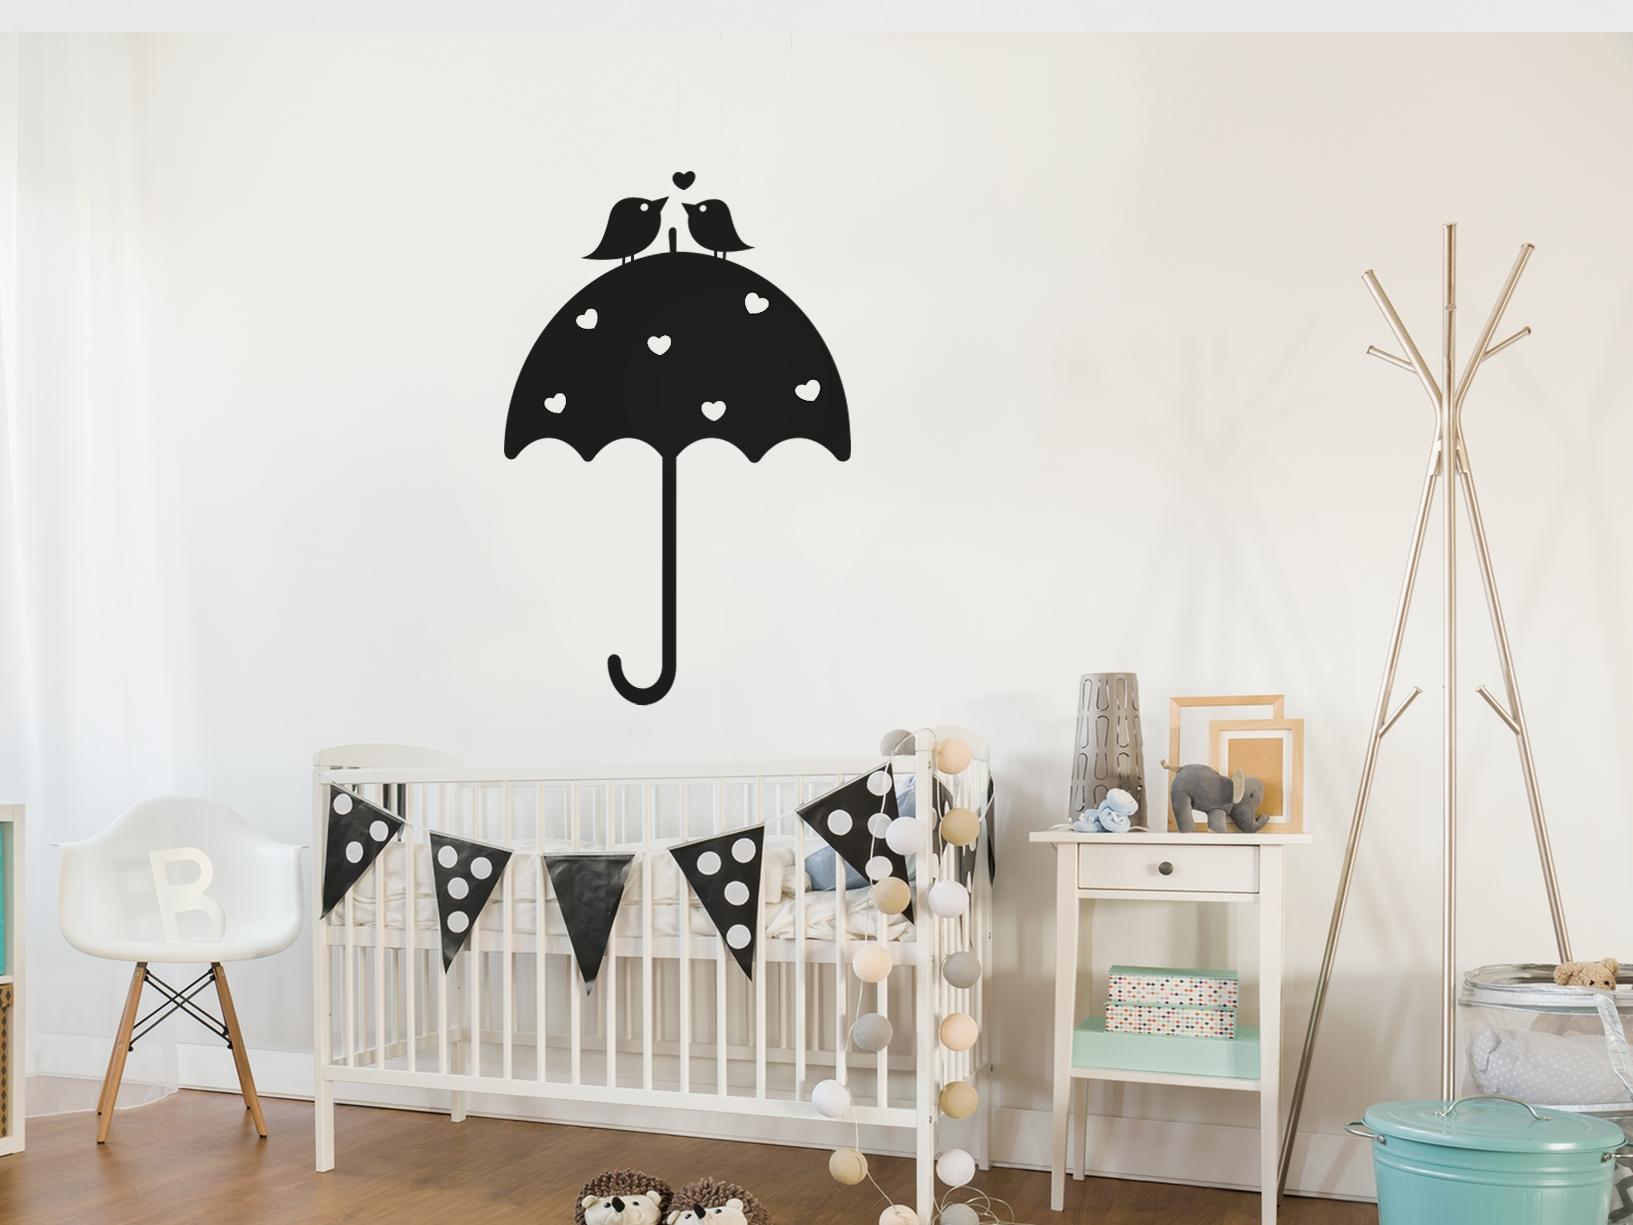 Muursticker paraplu met hartjes en vogeltjes - Deur wereldhuis paraplu ...